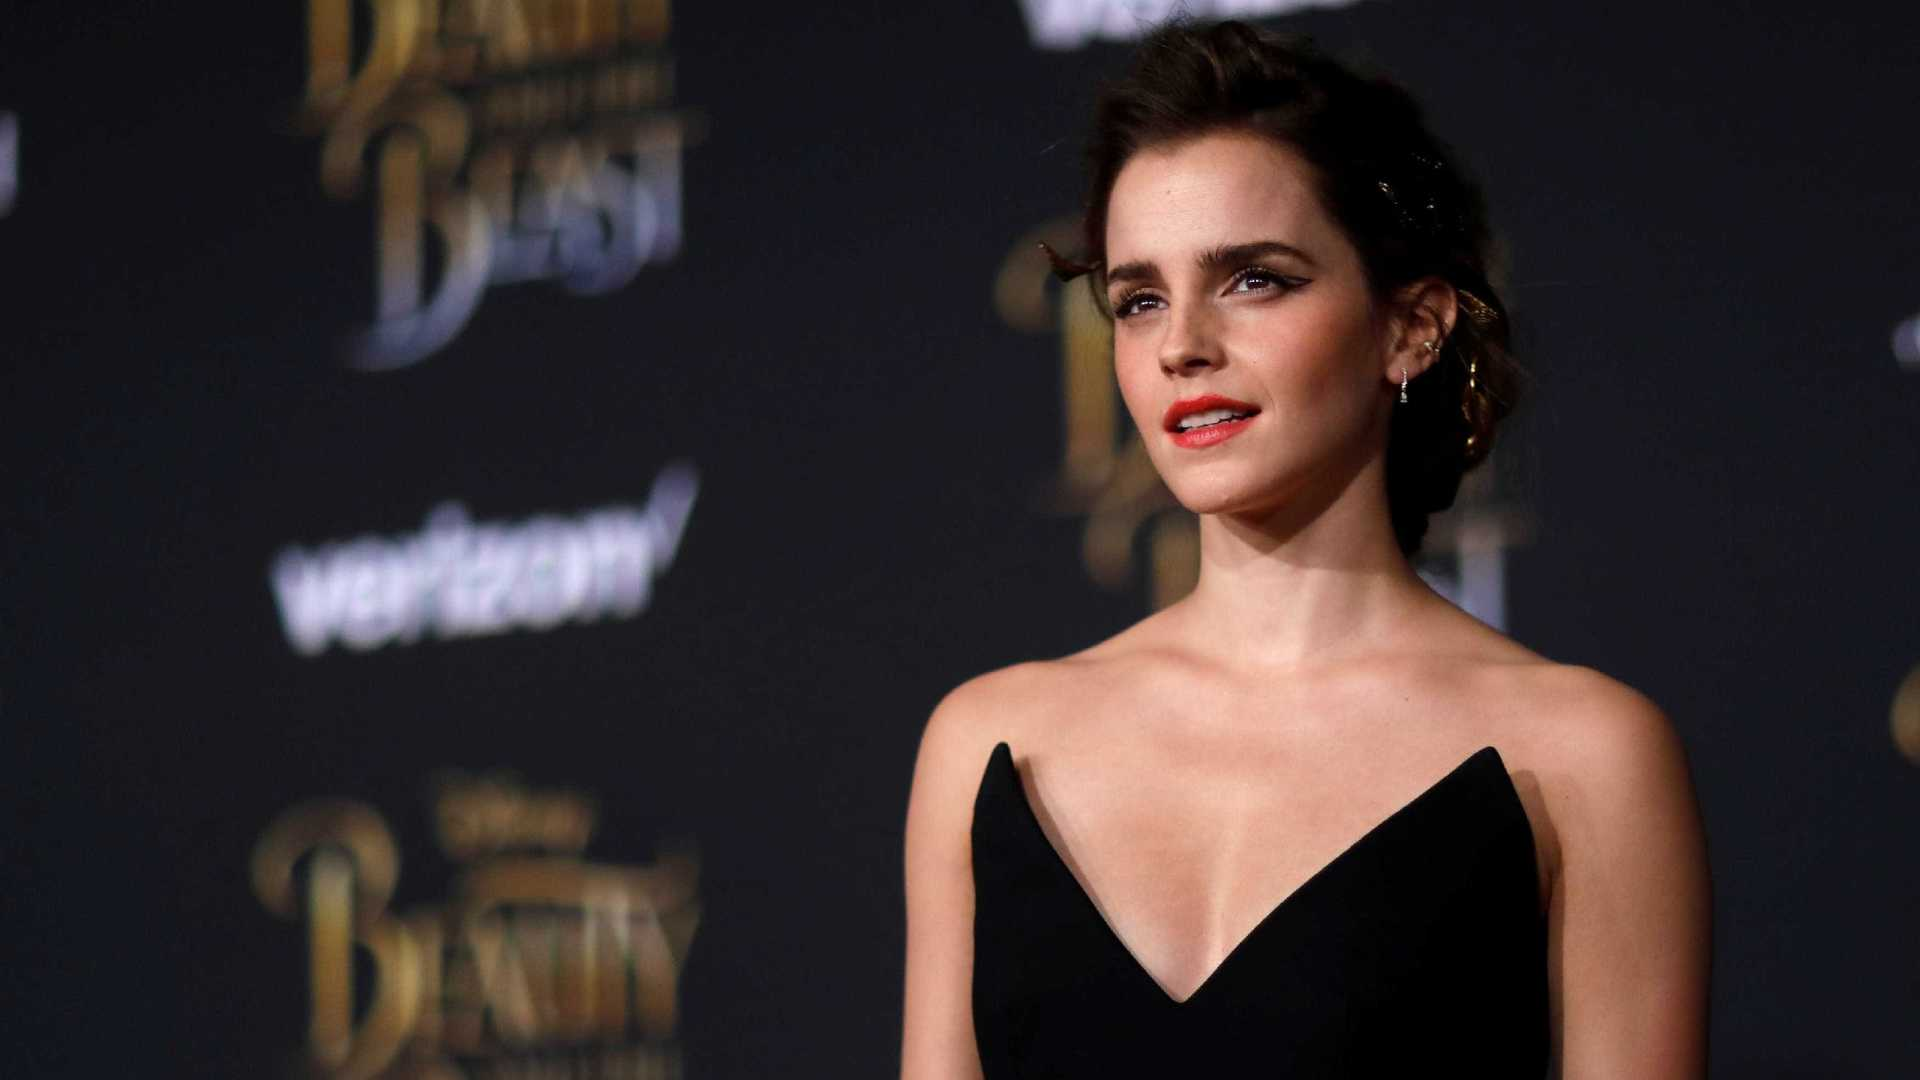 emma watson 1 - 'Aborto gratuito, seguro, legal e local é necessário', diz Emma Watson